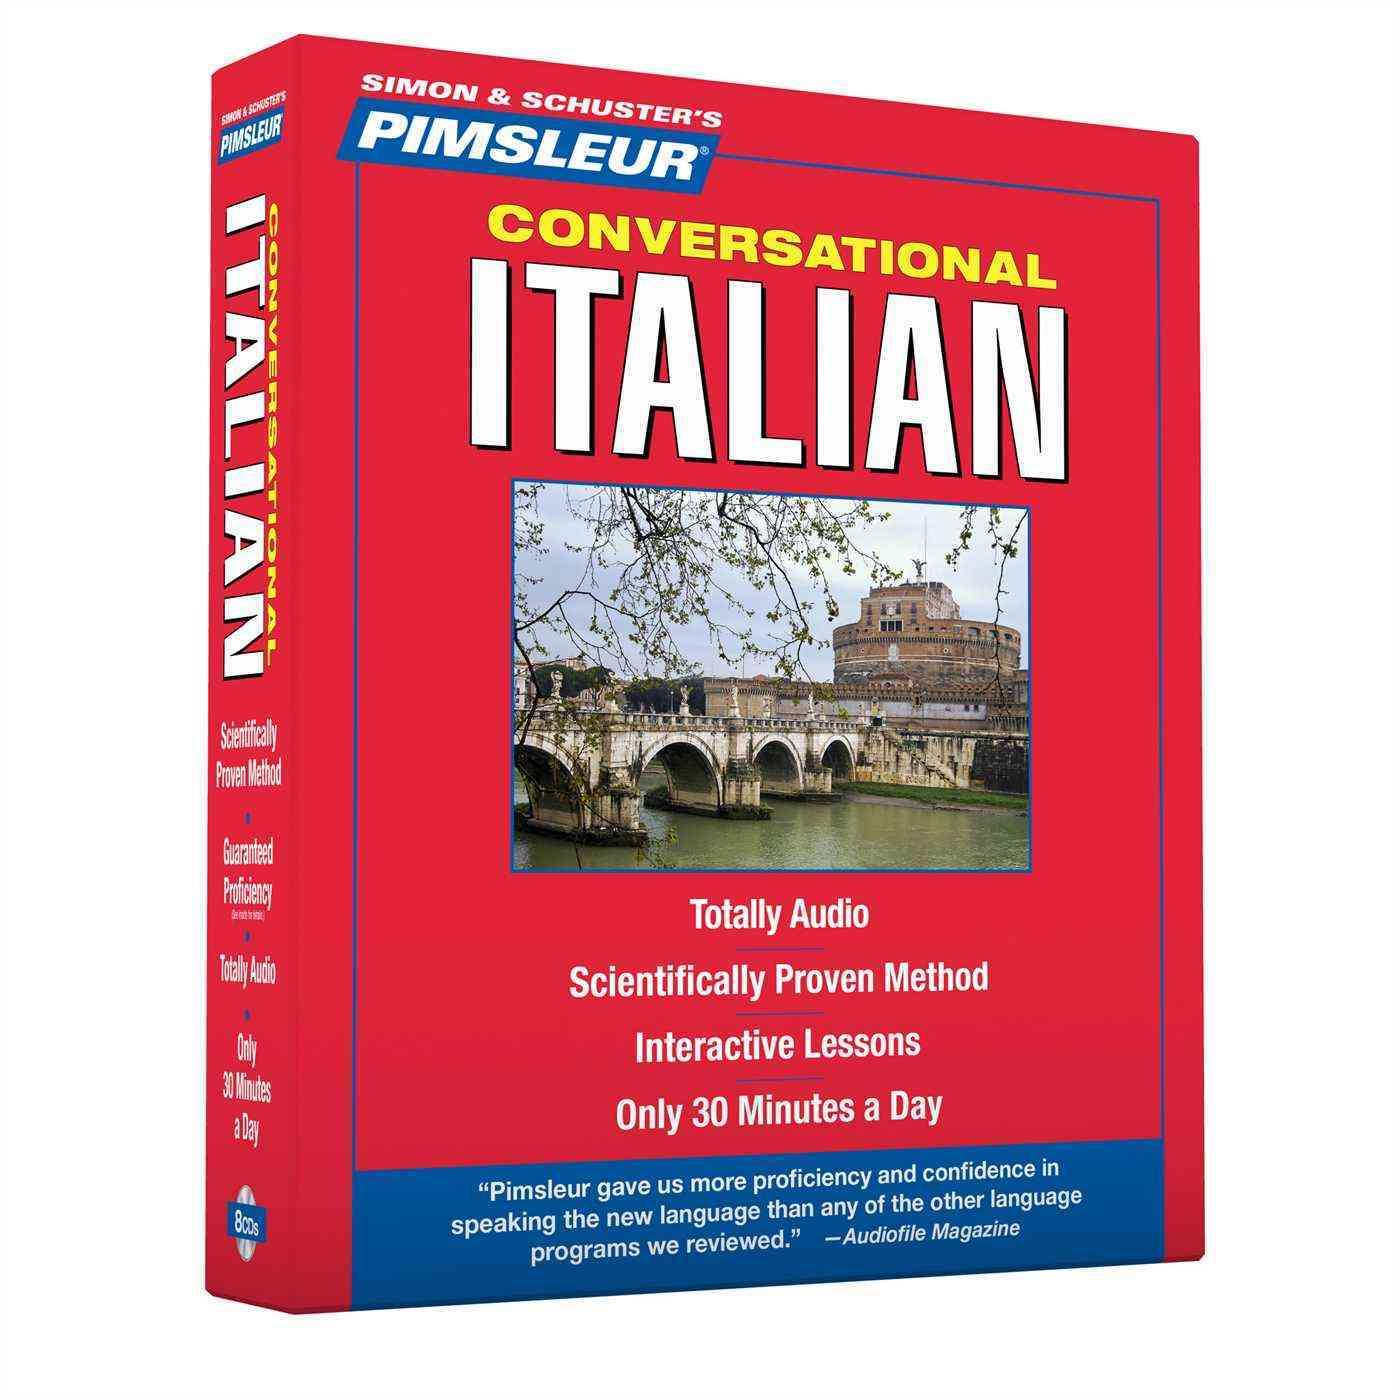 [CD] Pimsleur Conversational Italian